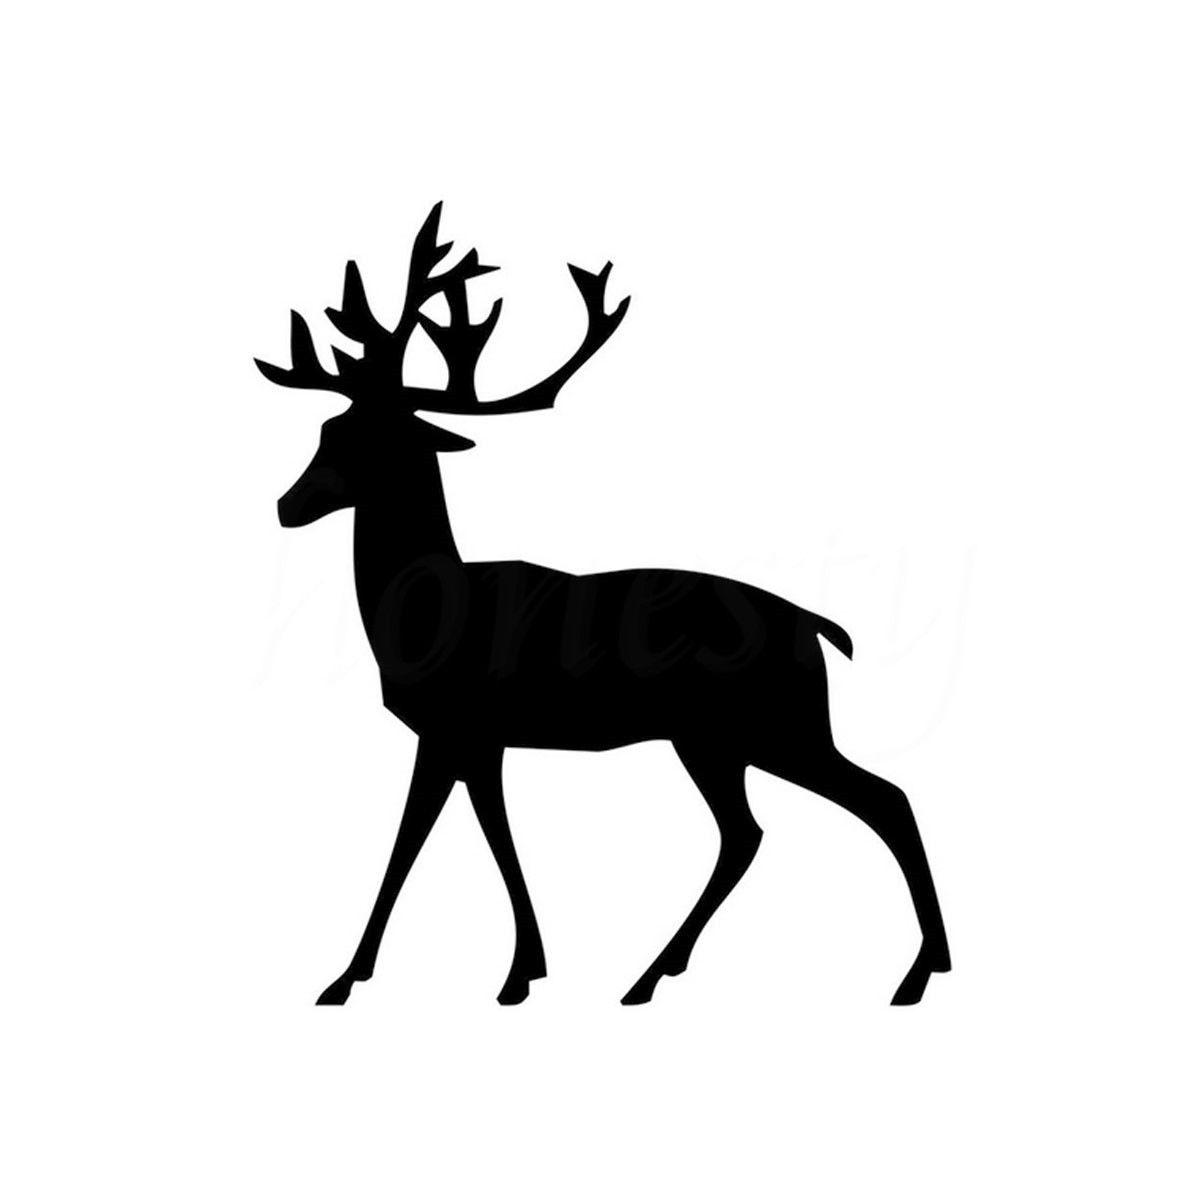 Ciervos Elk Animal Divertido Etiqueta Engomada Del Coche Del Hogar de la Pared d